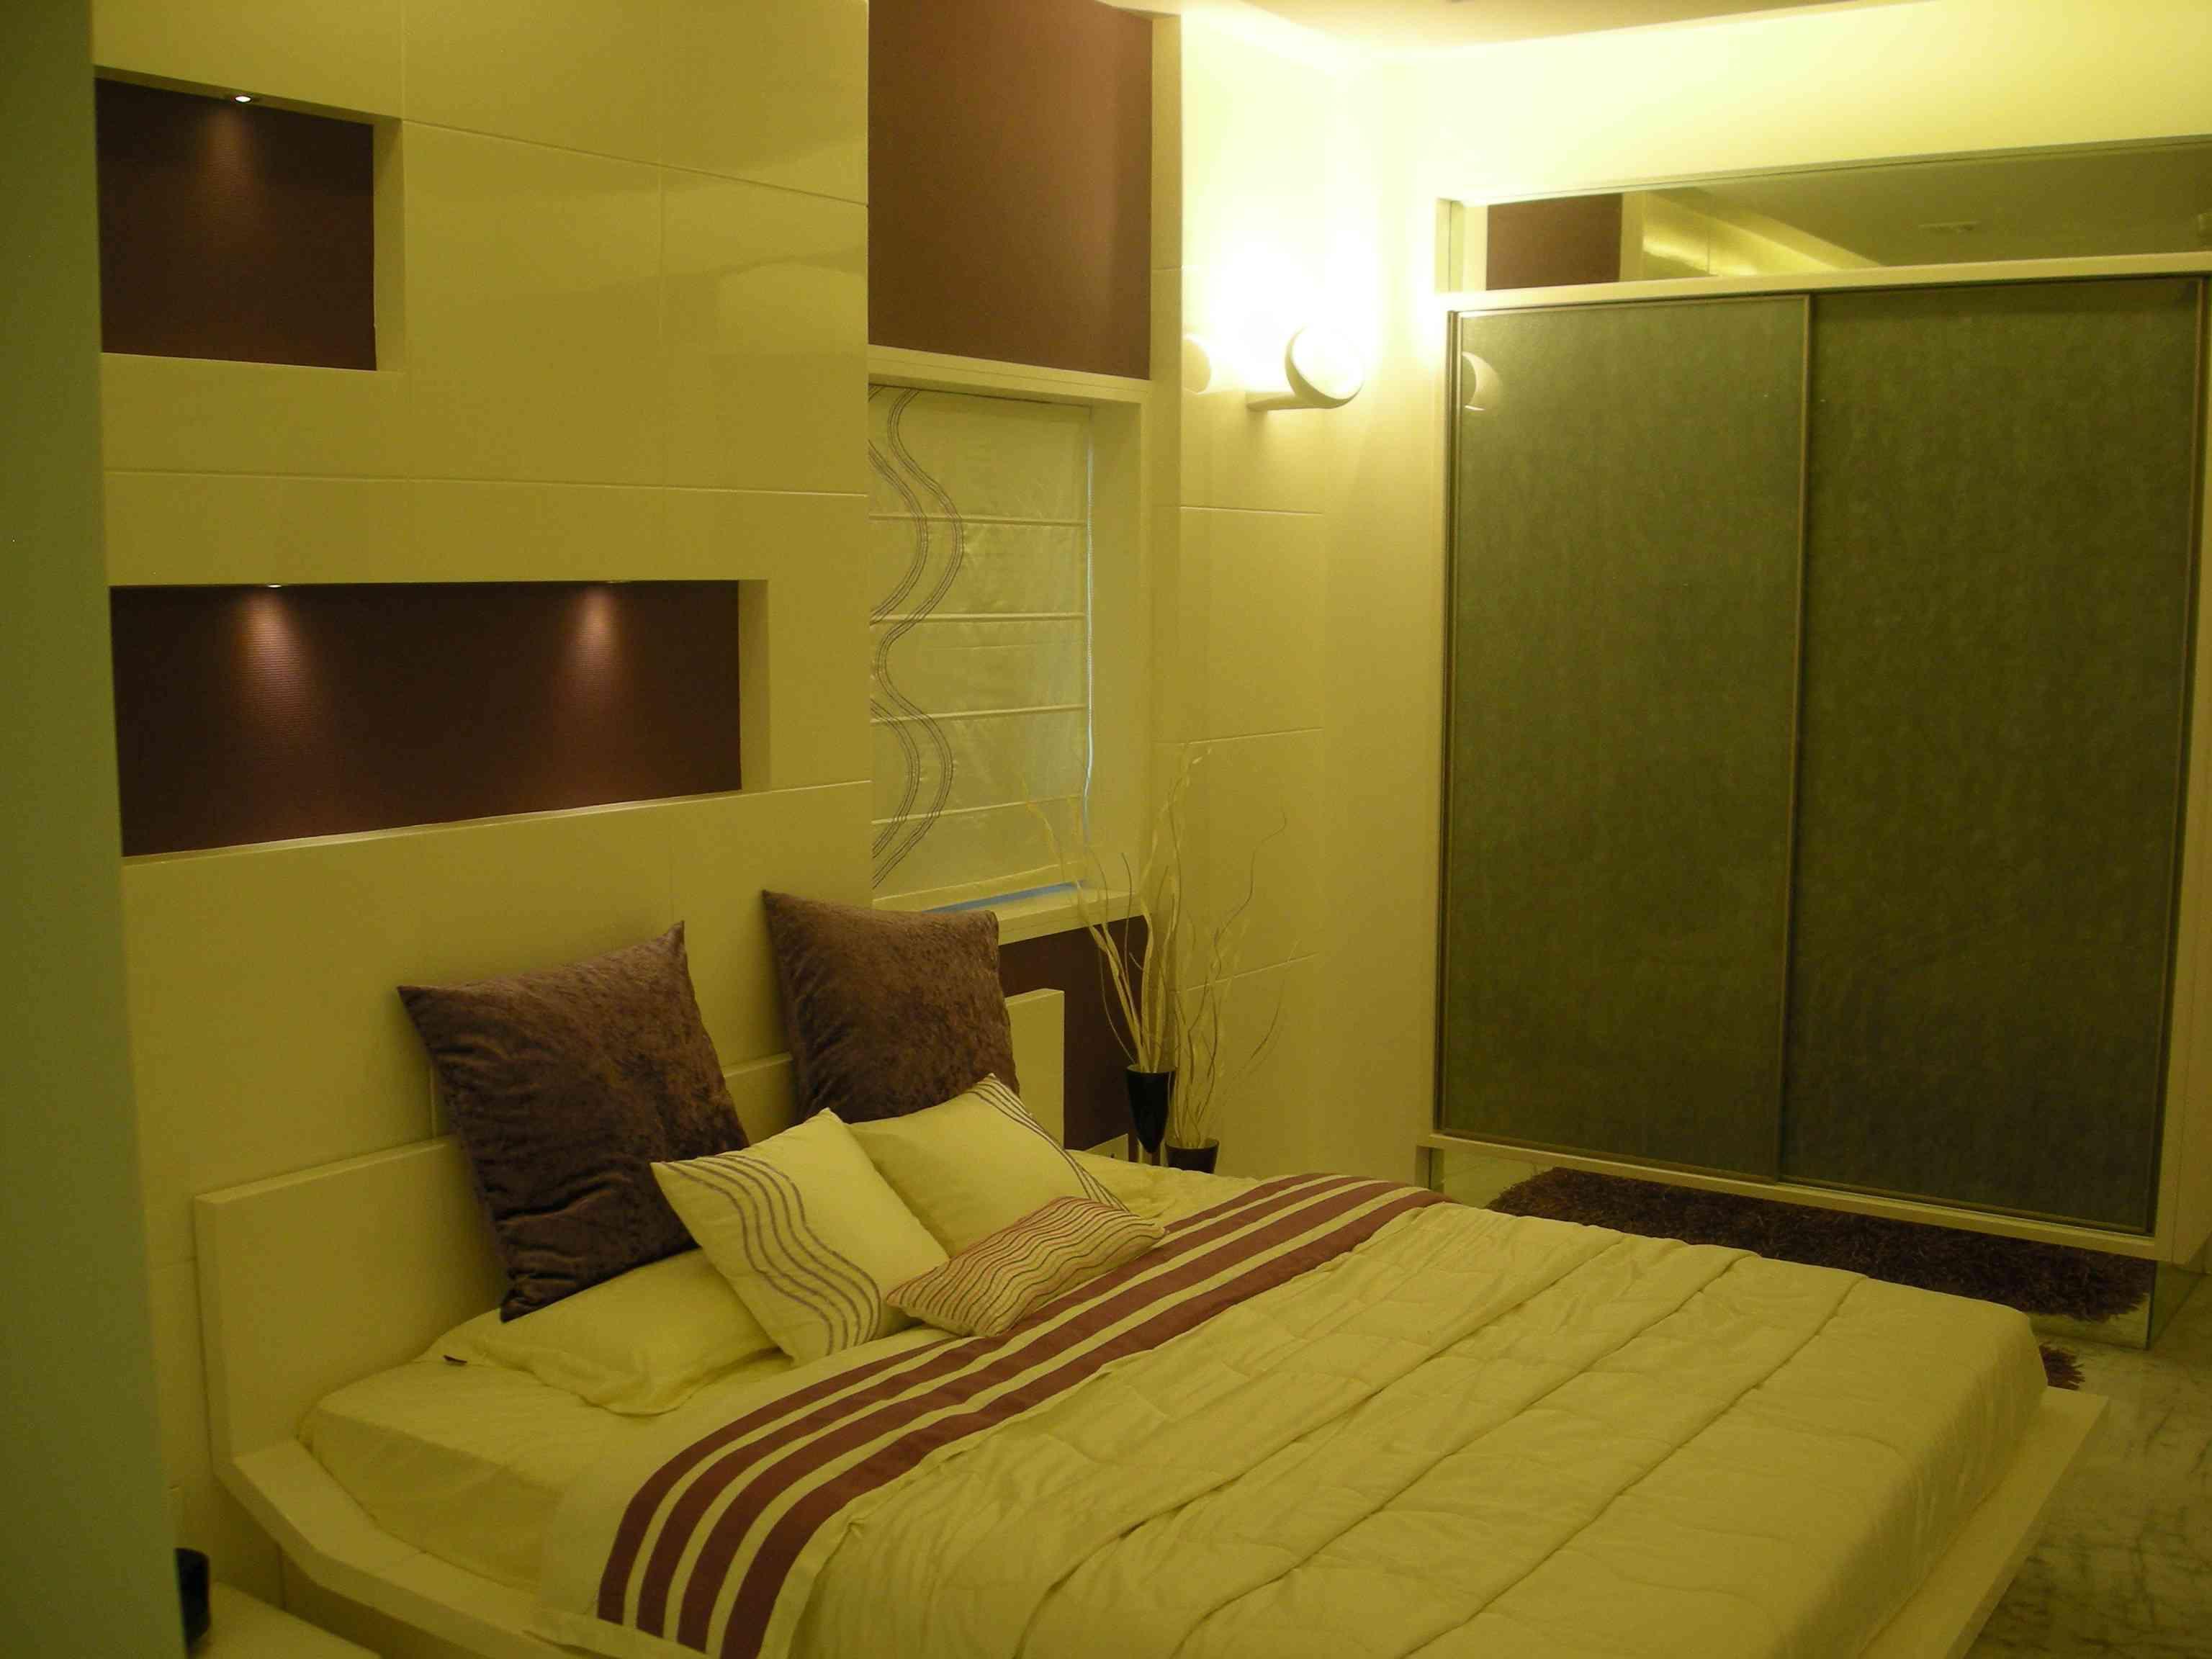 West bengal master bedroom design and kolkata on pinterest for Bengals bedroom ideas